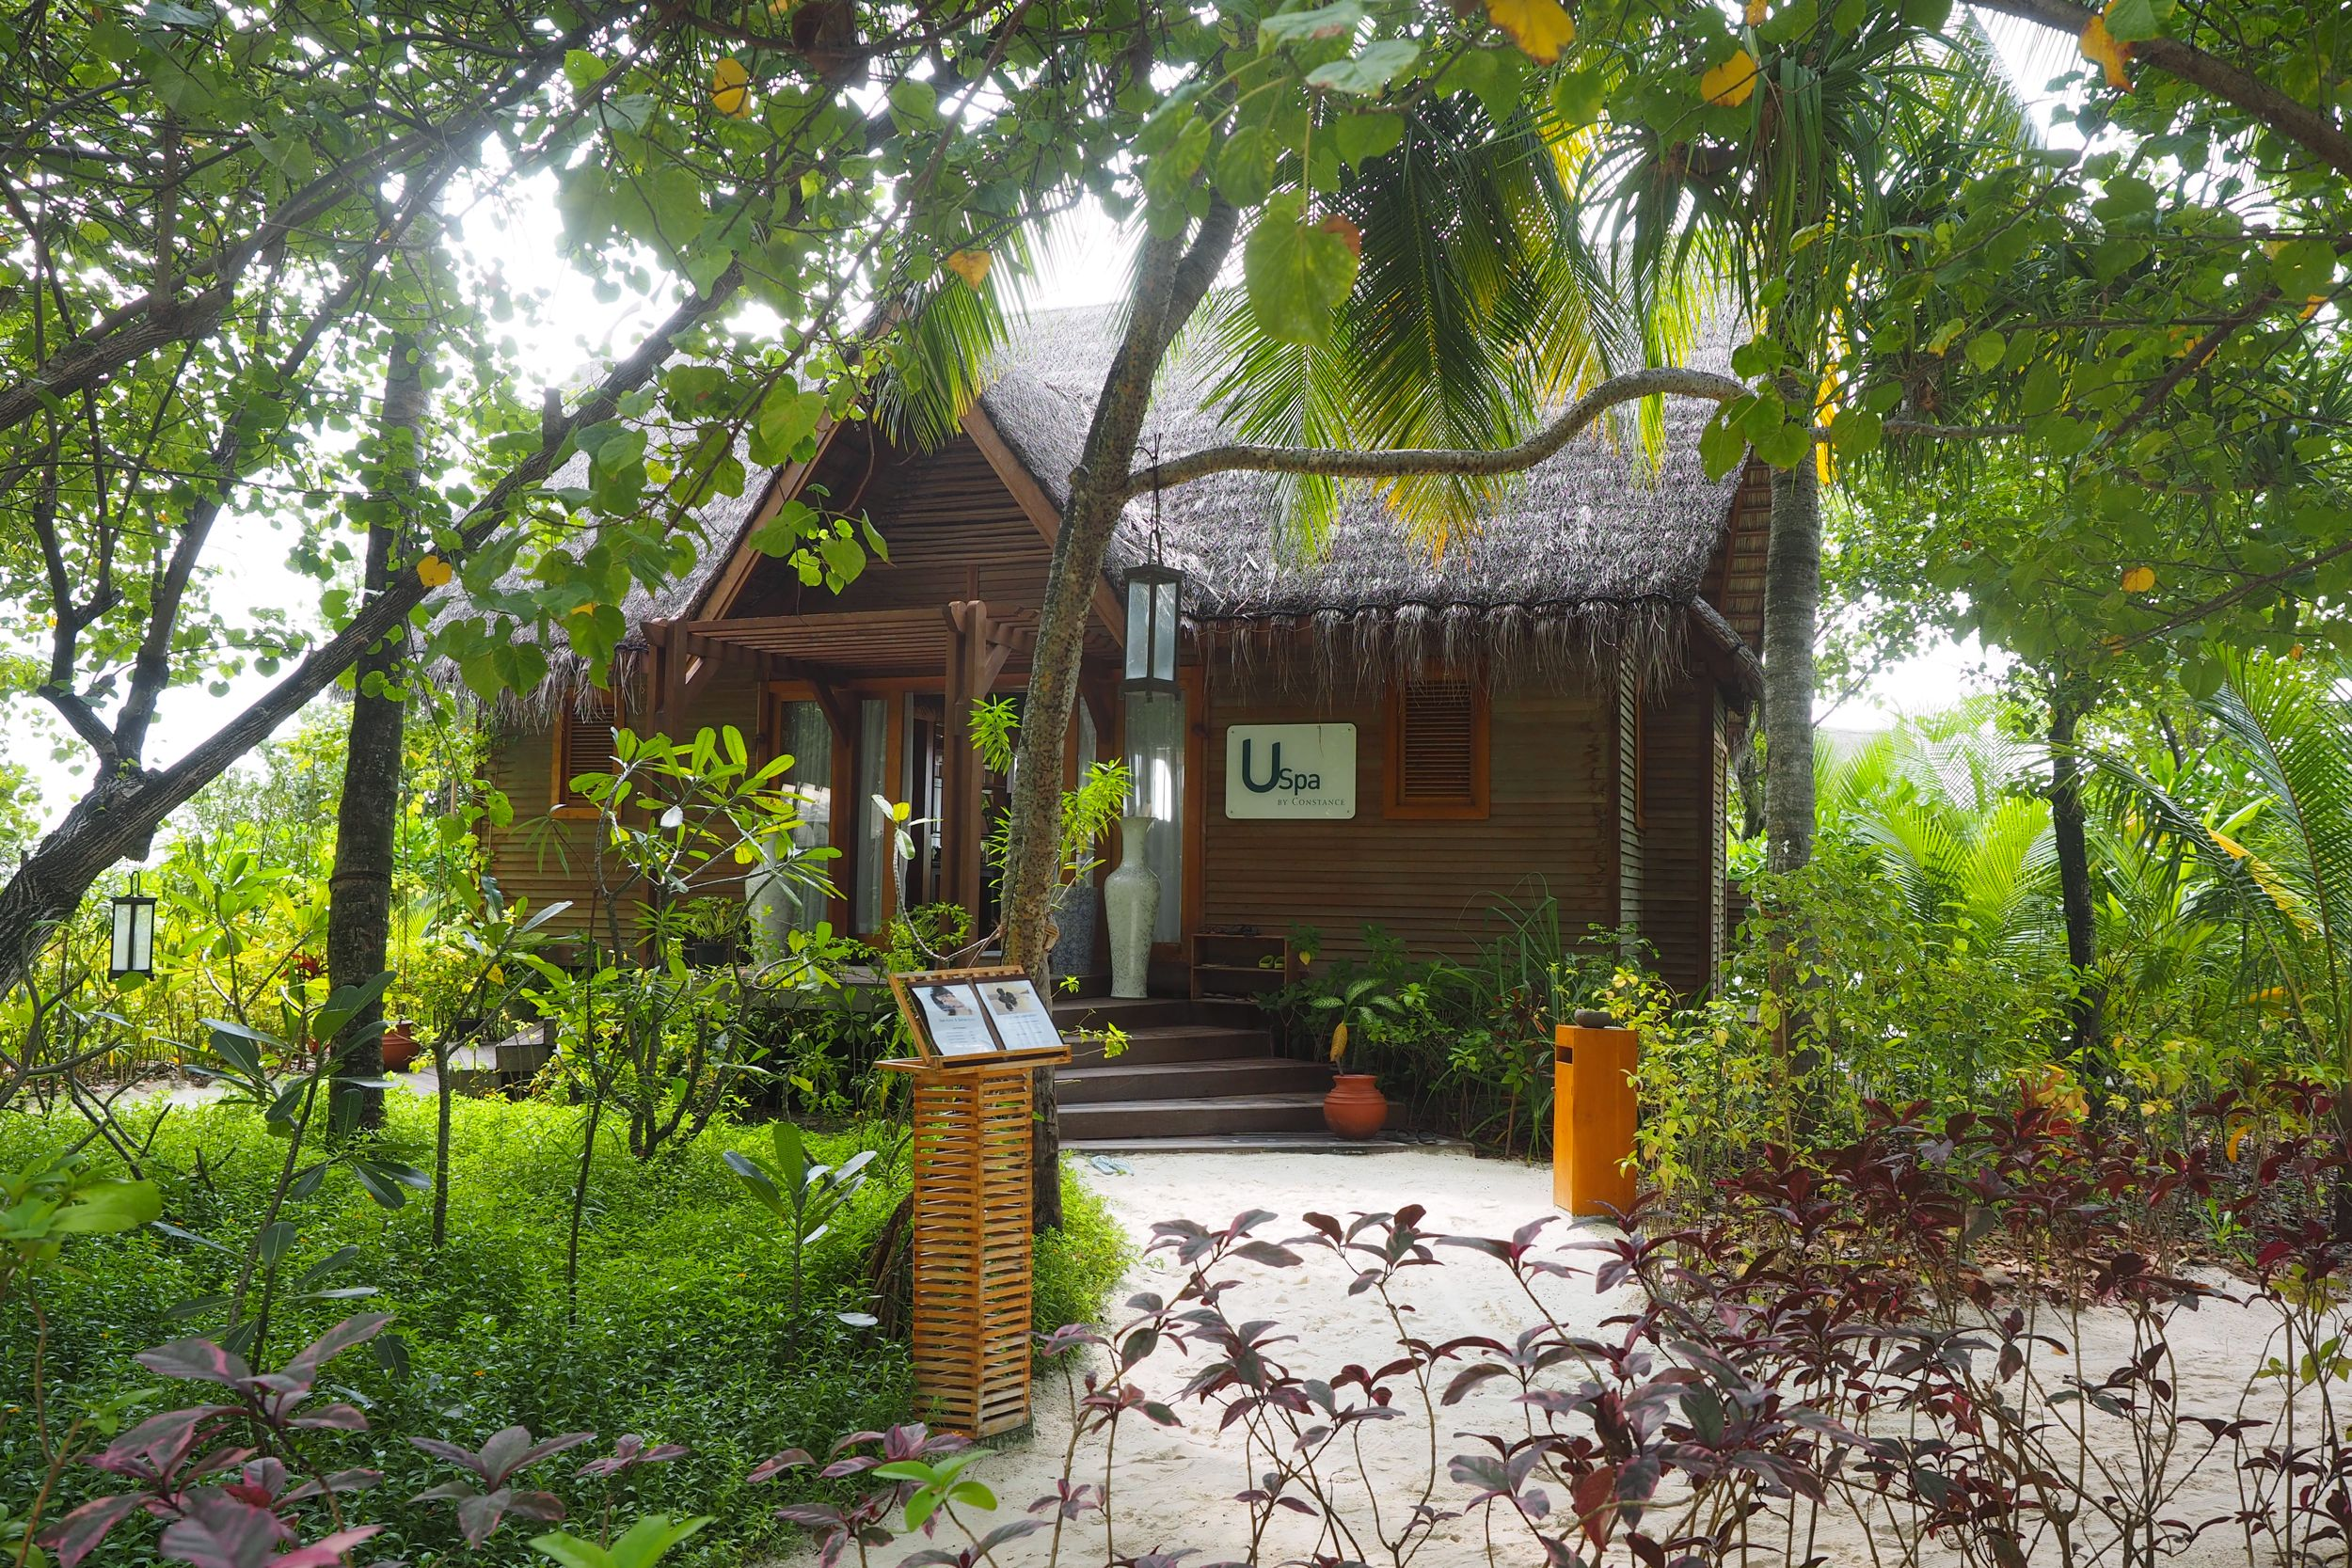 maldives, constance hotels, maldiv, constance, billur saatci, off nereye gitsem, offnegiysem, turkish blogger, heaven, vacation, moofushi, halaveli, uspa,